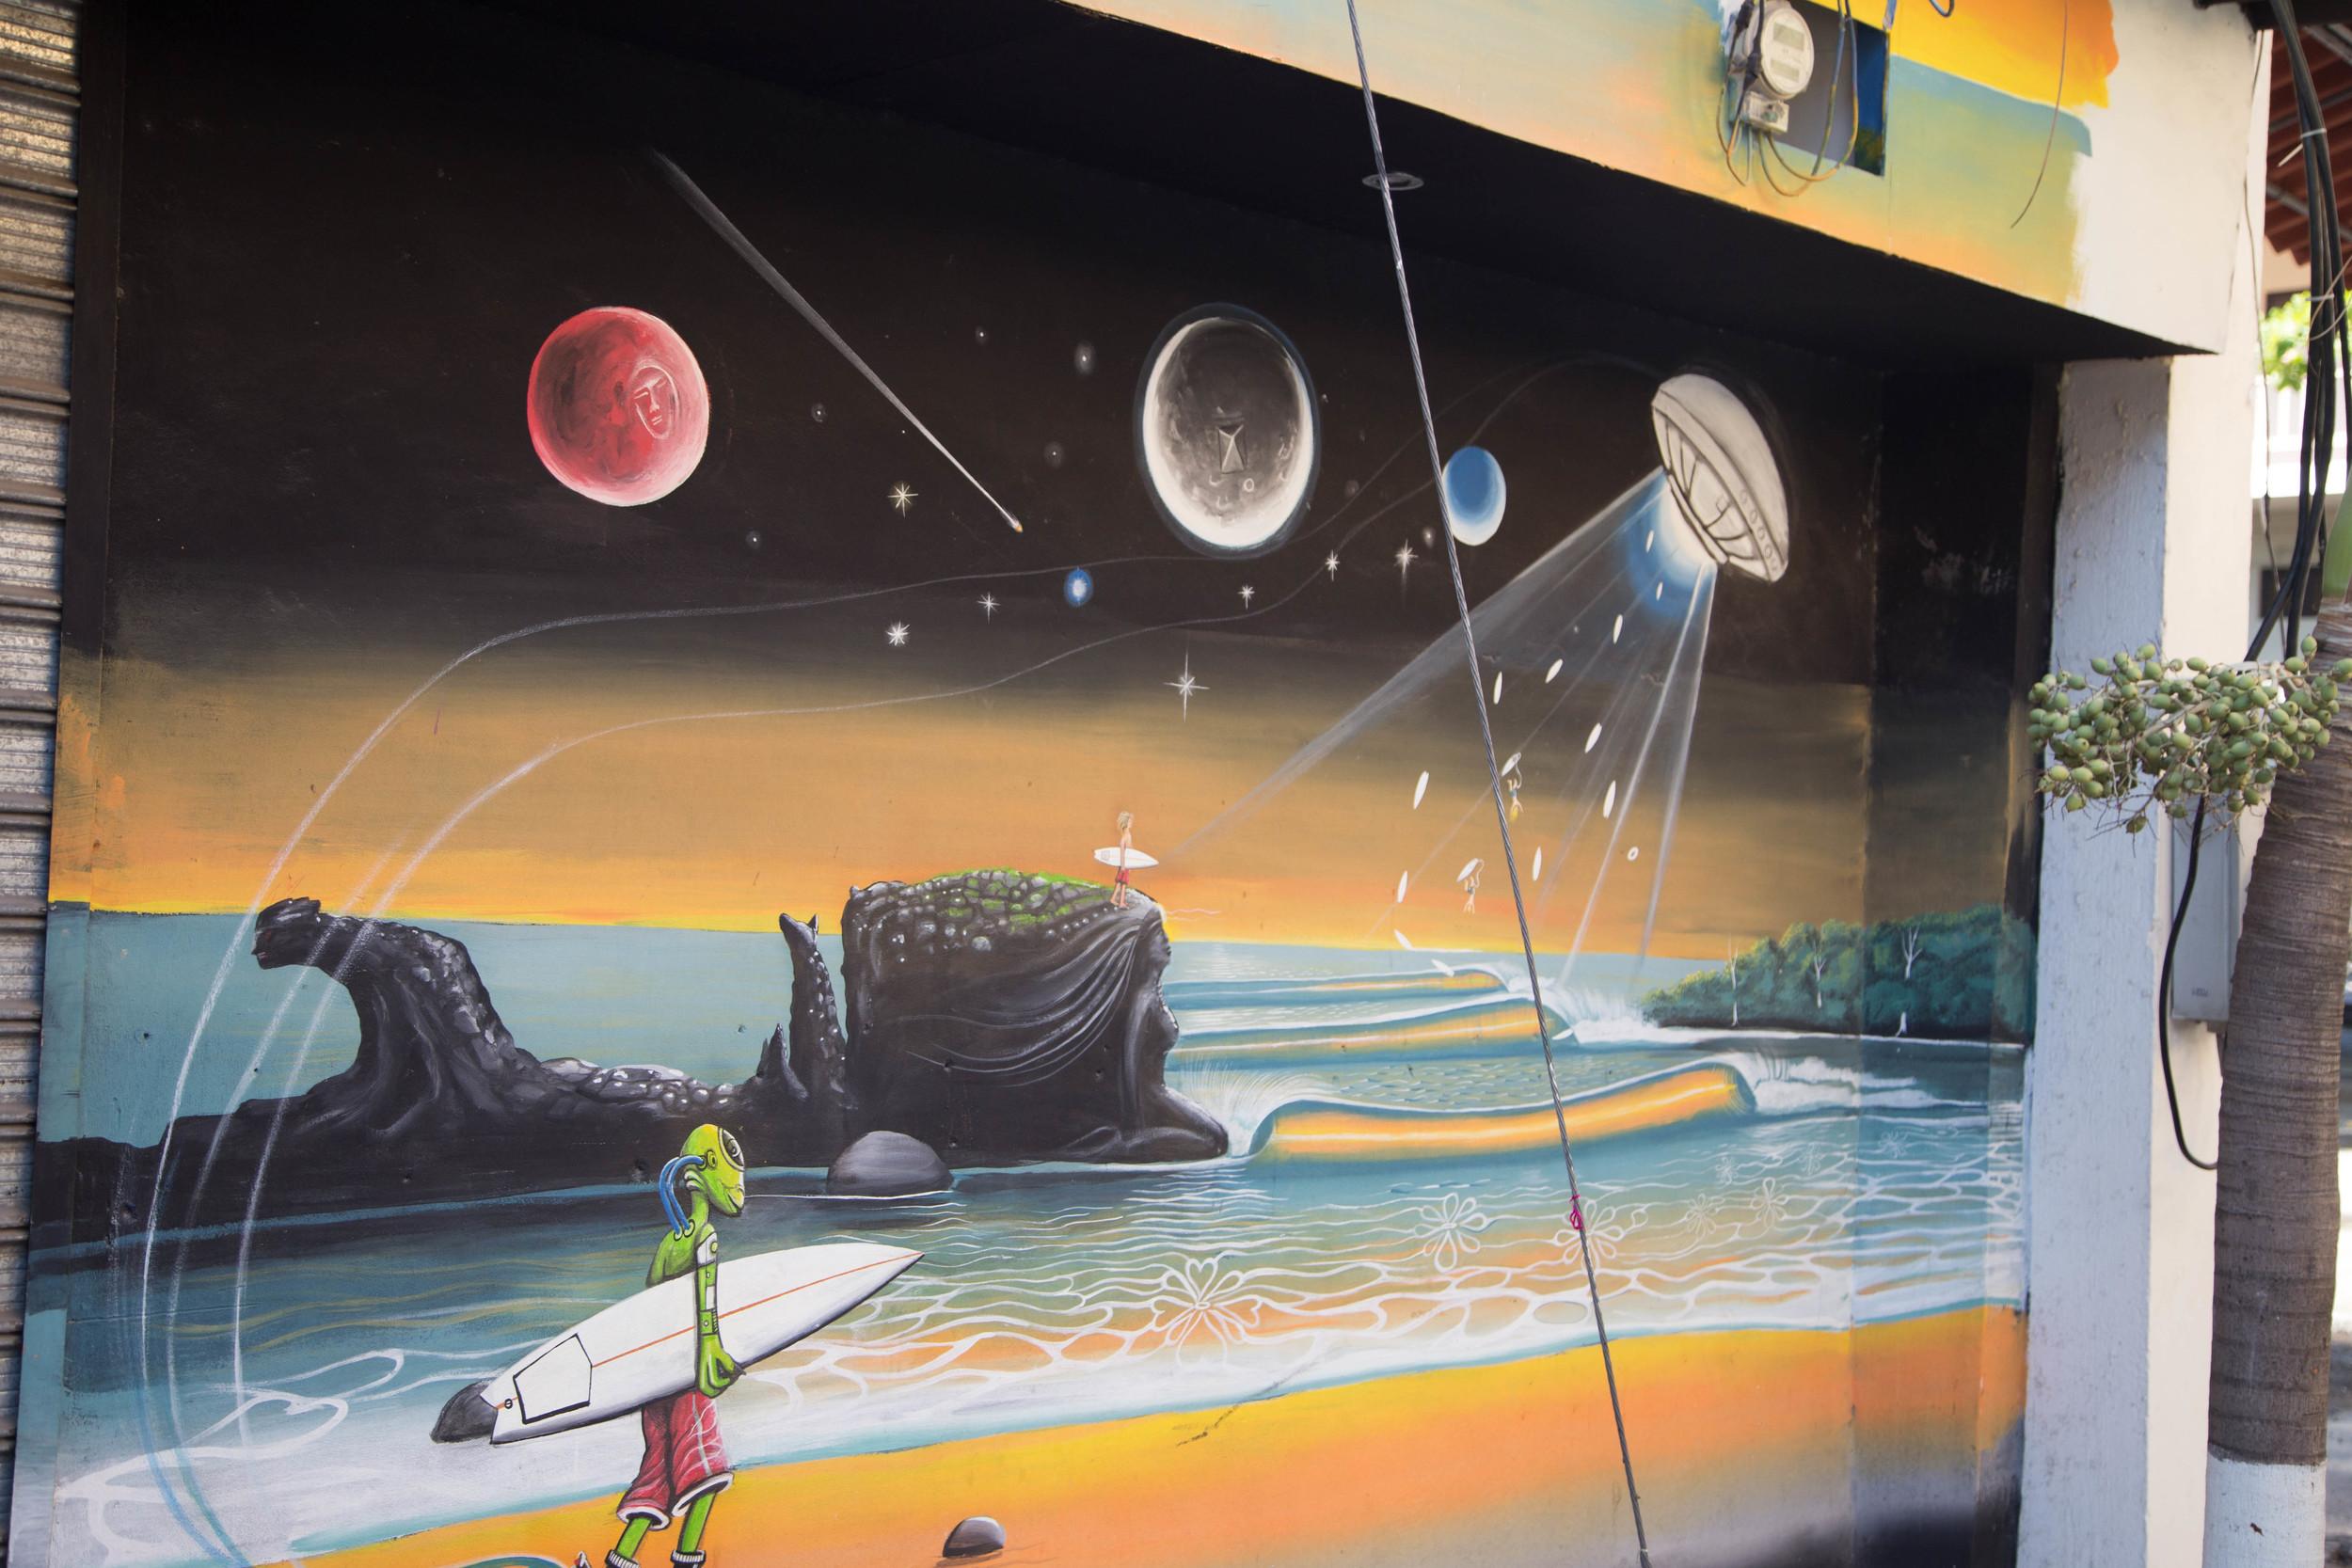 Local Mural. Pretty self explanatory, aliens love to surf.